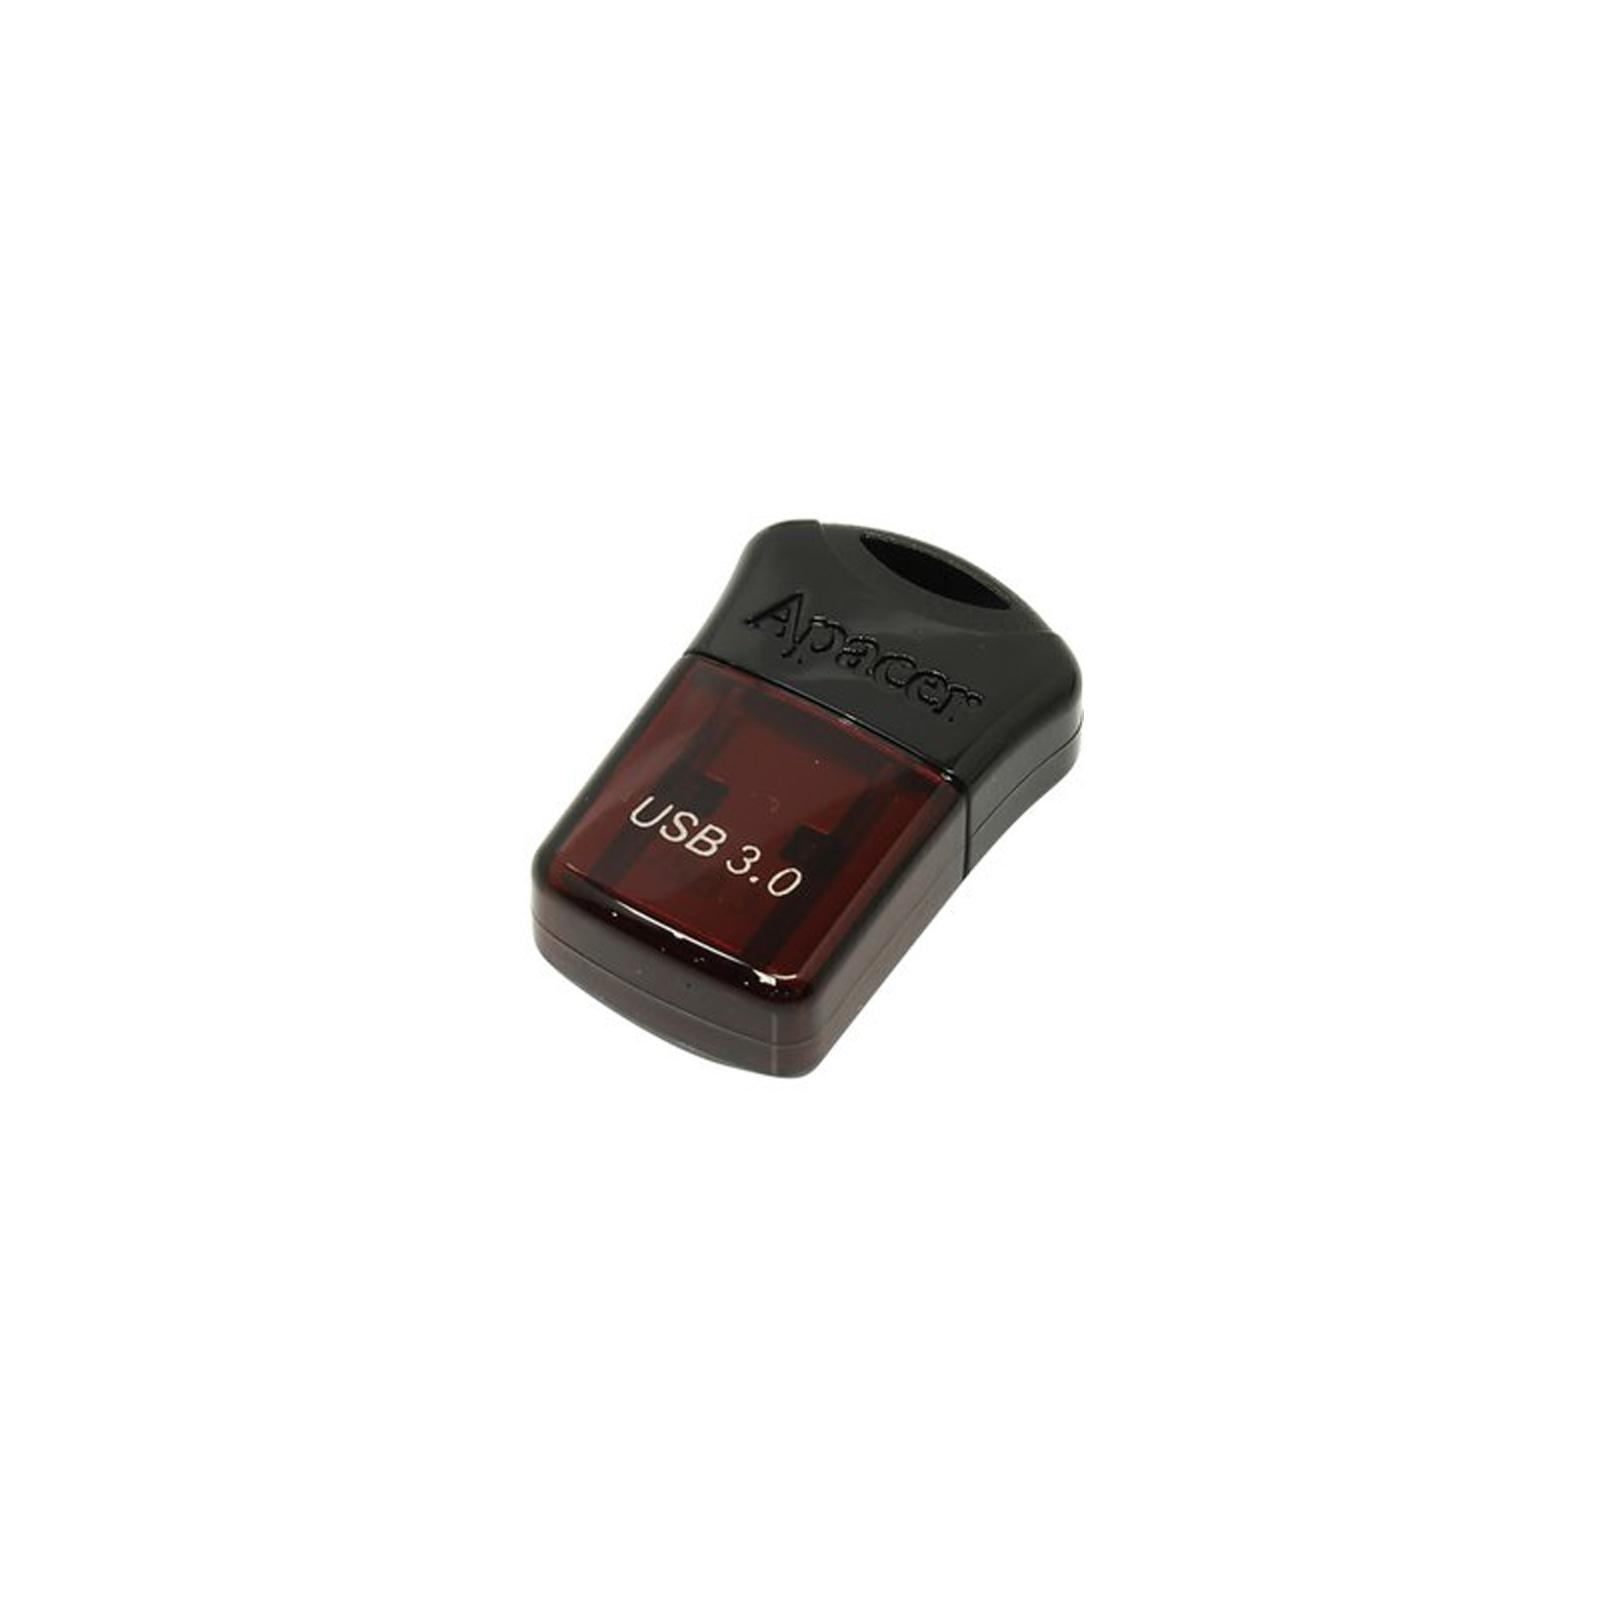 USB флеш накопитель Apacer 8GB AH157 Red USB 3.0 (AP8GAH157R-1) изображение 4